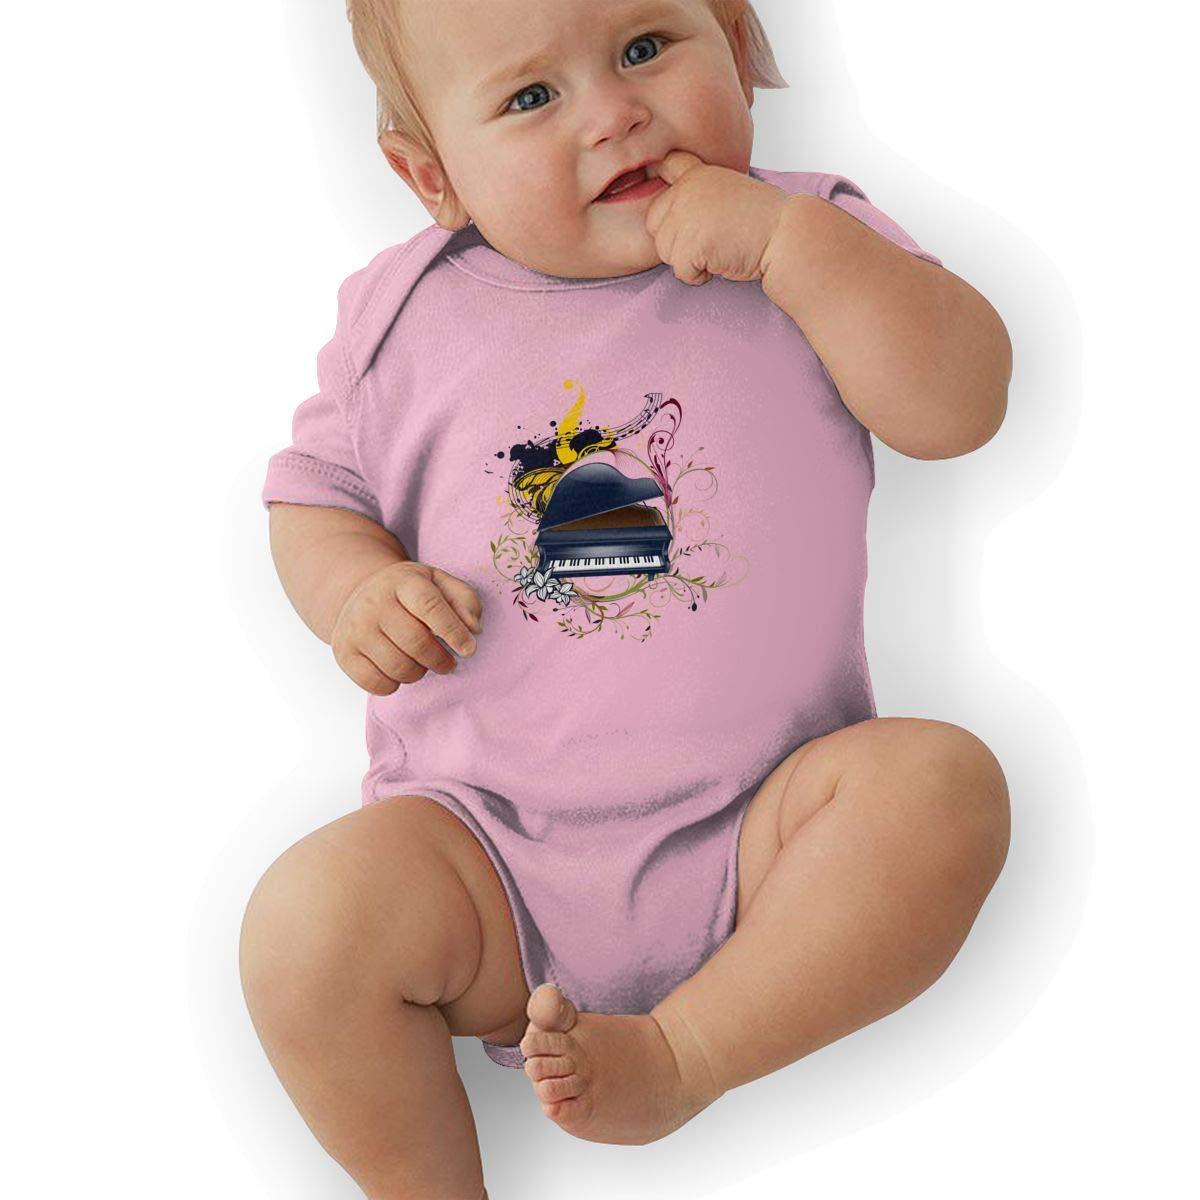 Toddler Baby Boys Bodysuit Short-Sleeve Onesie Piano Life Print Rompers Summer Pajamas